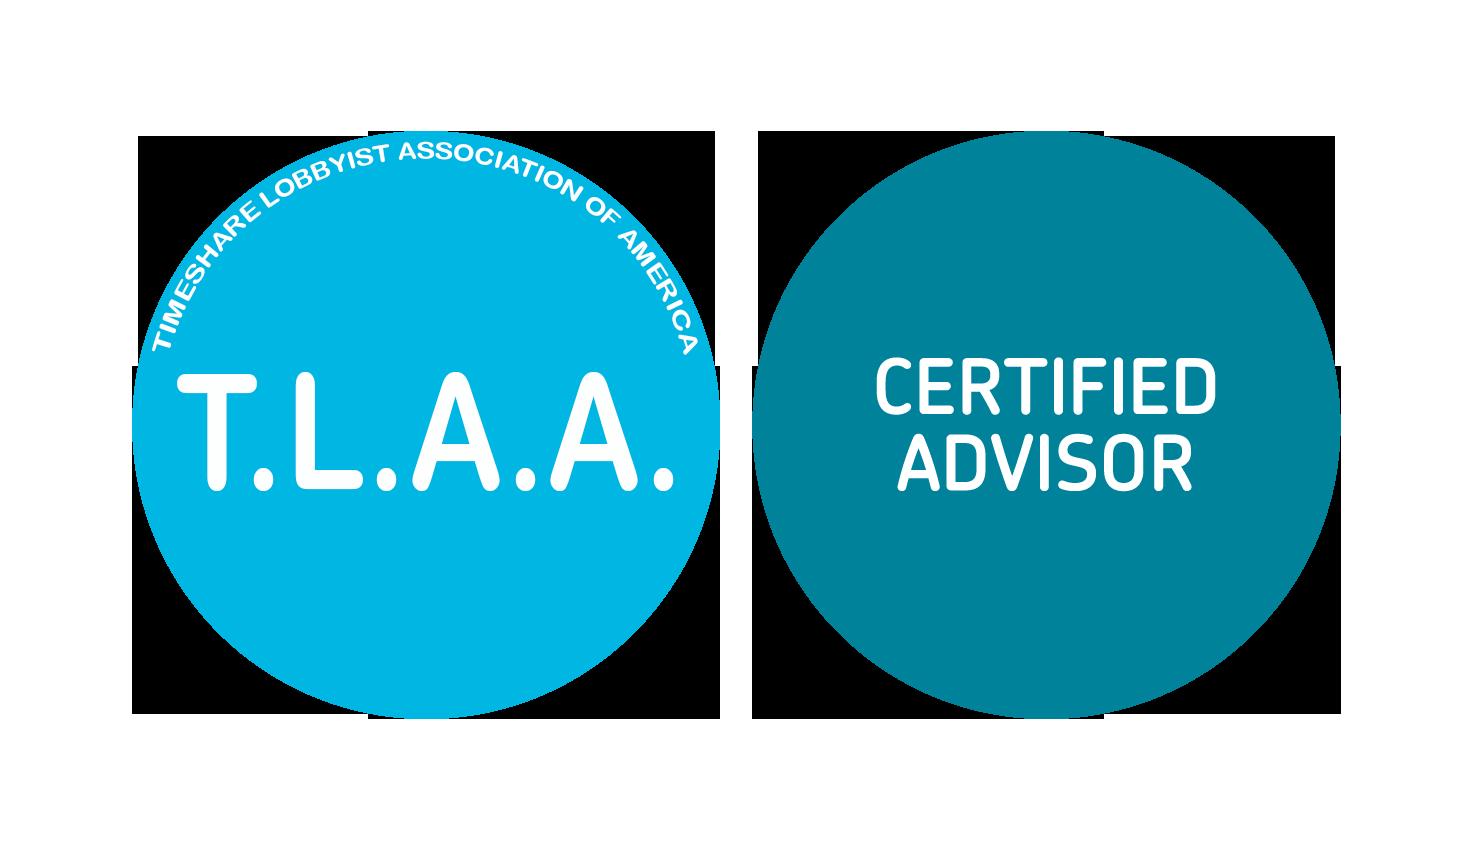 Timeshare Lobbyist Assoc. Certified Advisor